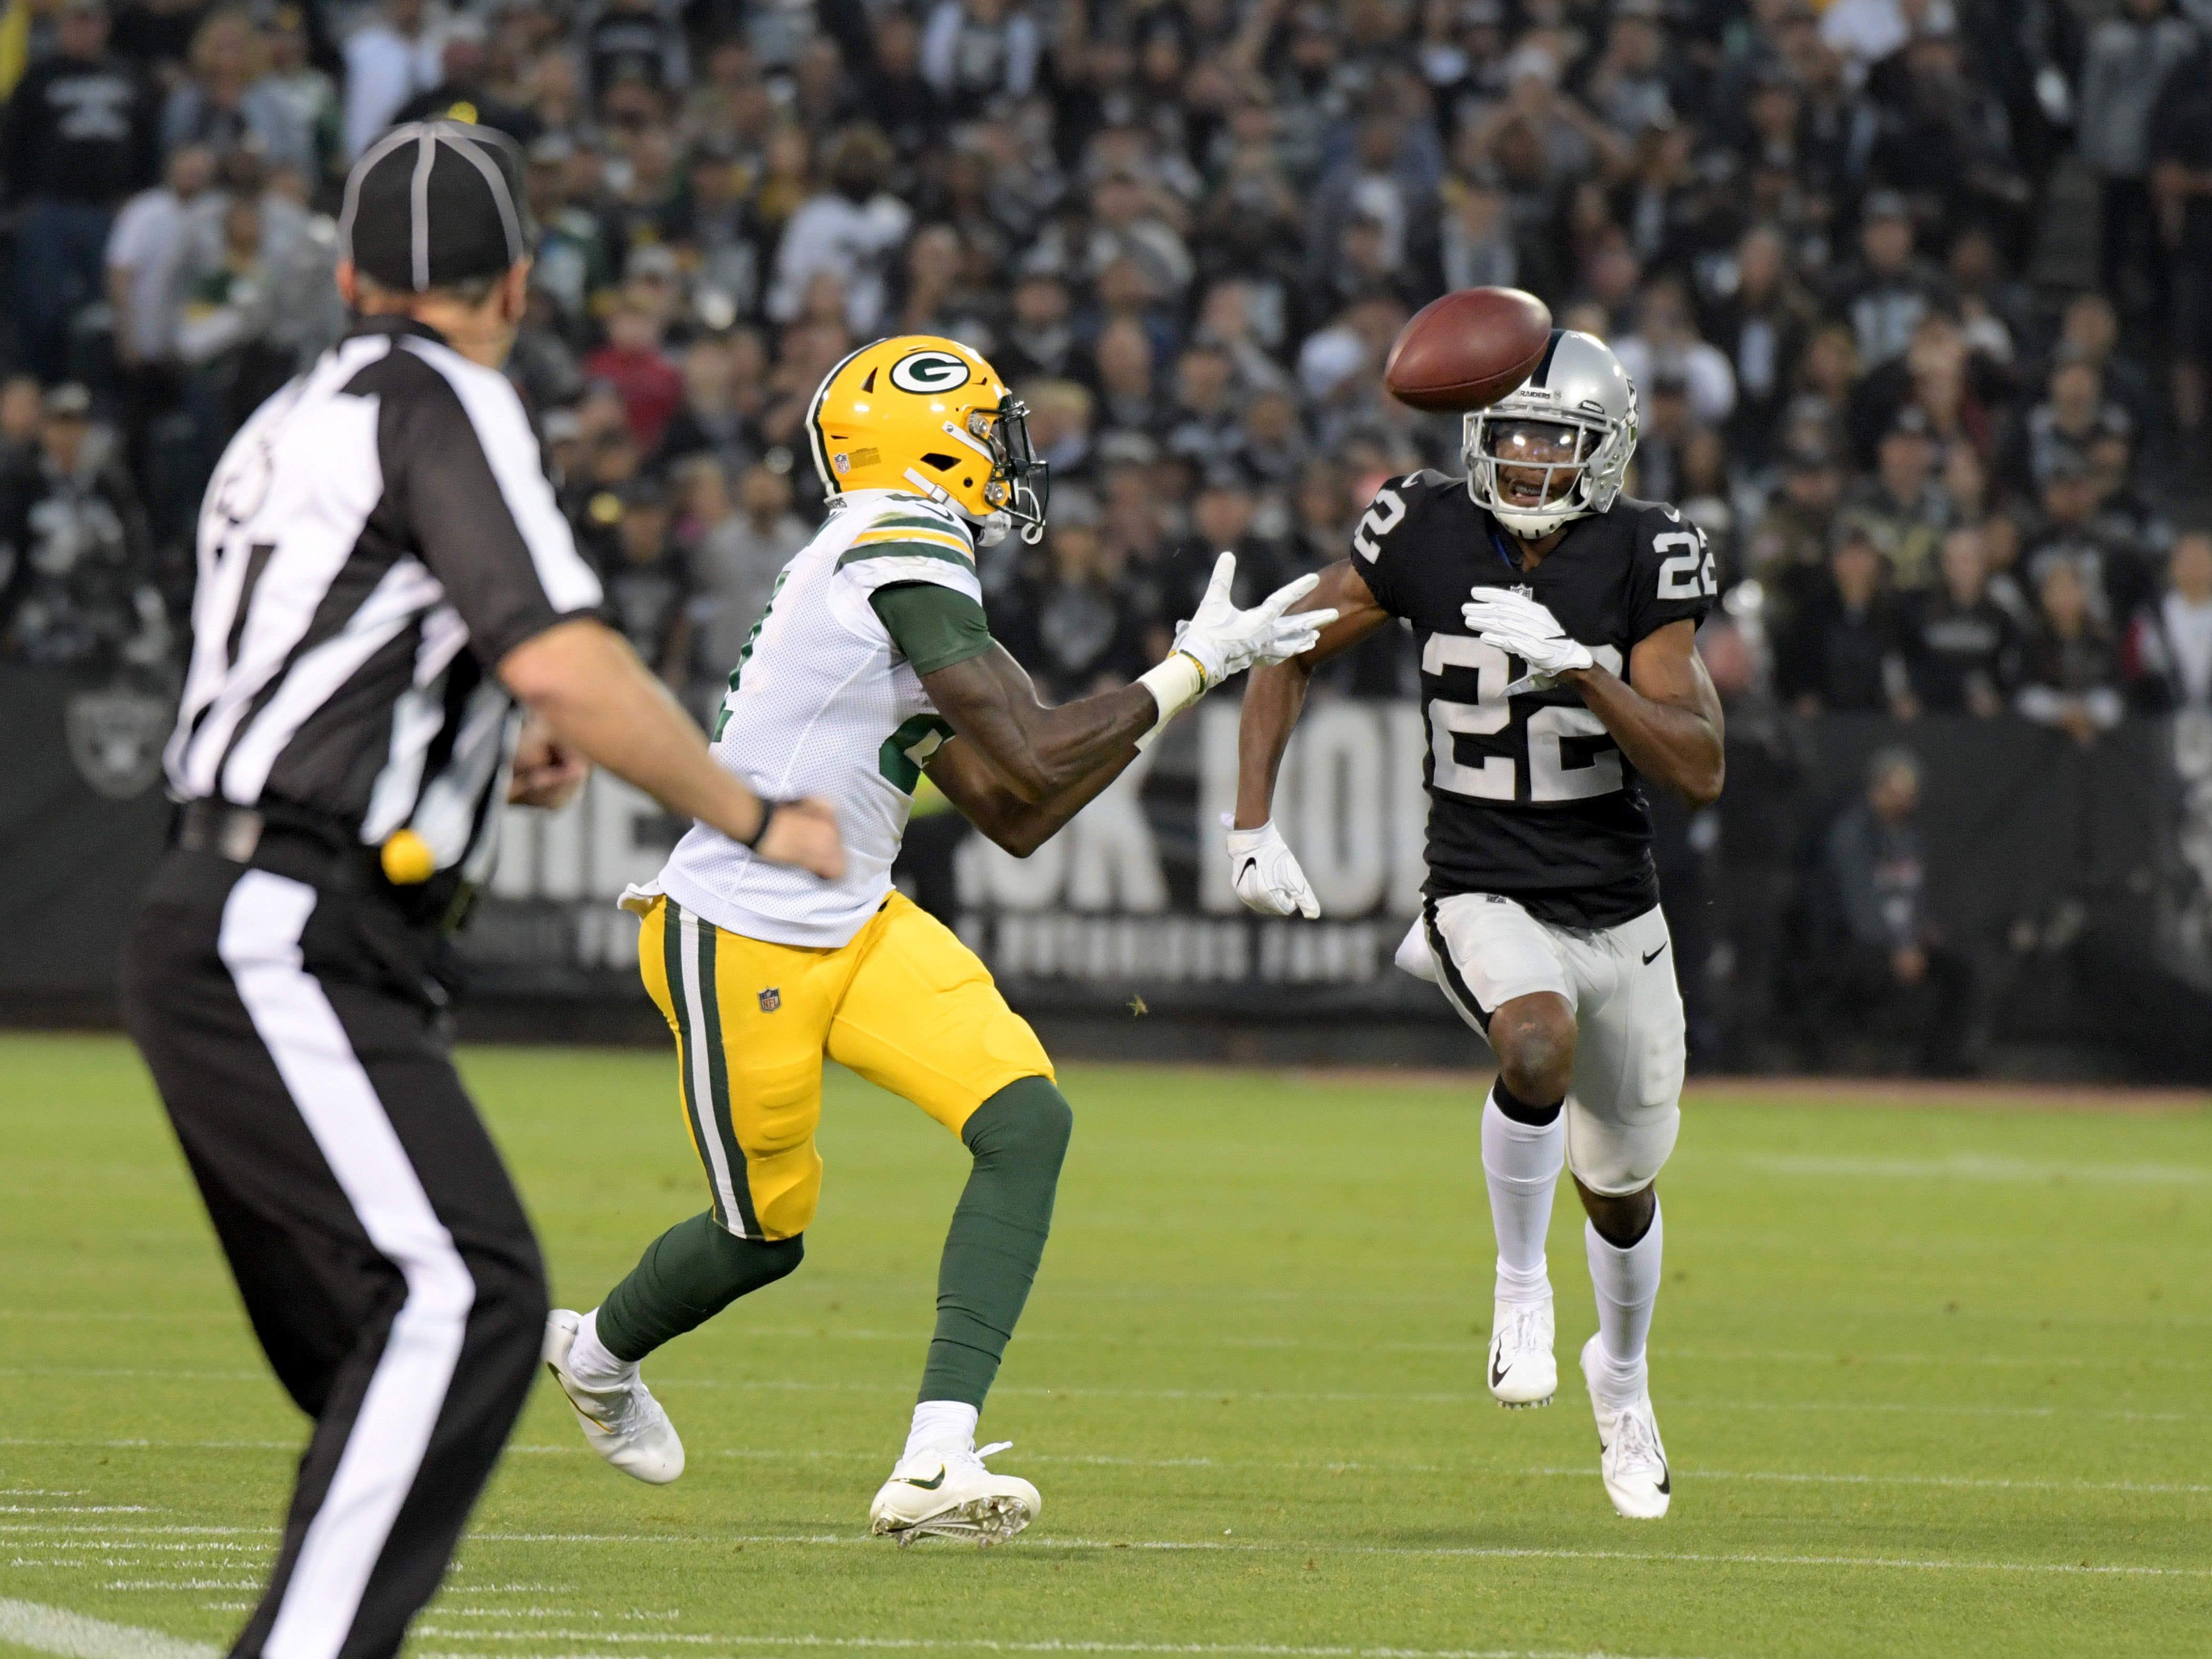 Week 7: Raiders at Packers, noon CT Sunday, Oct. 20, Lambeau Field (CBS)